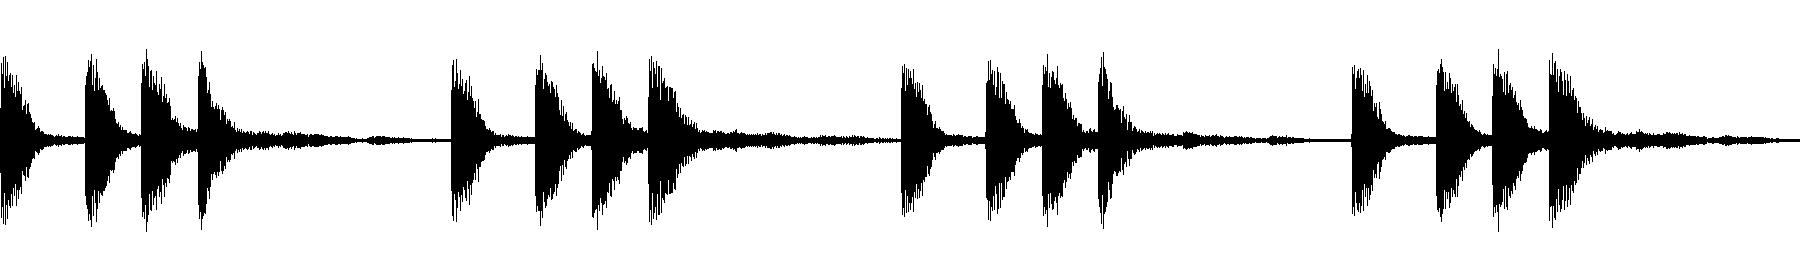 dts chordlp 13 cm wet